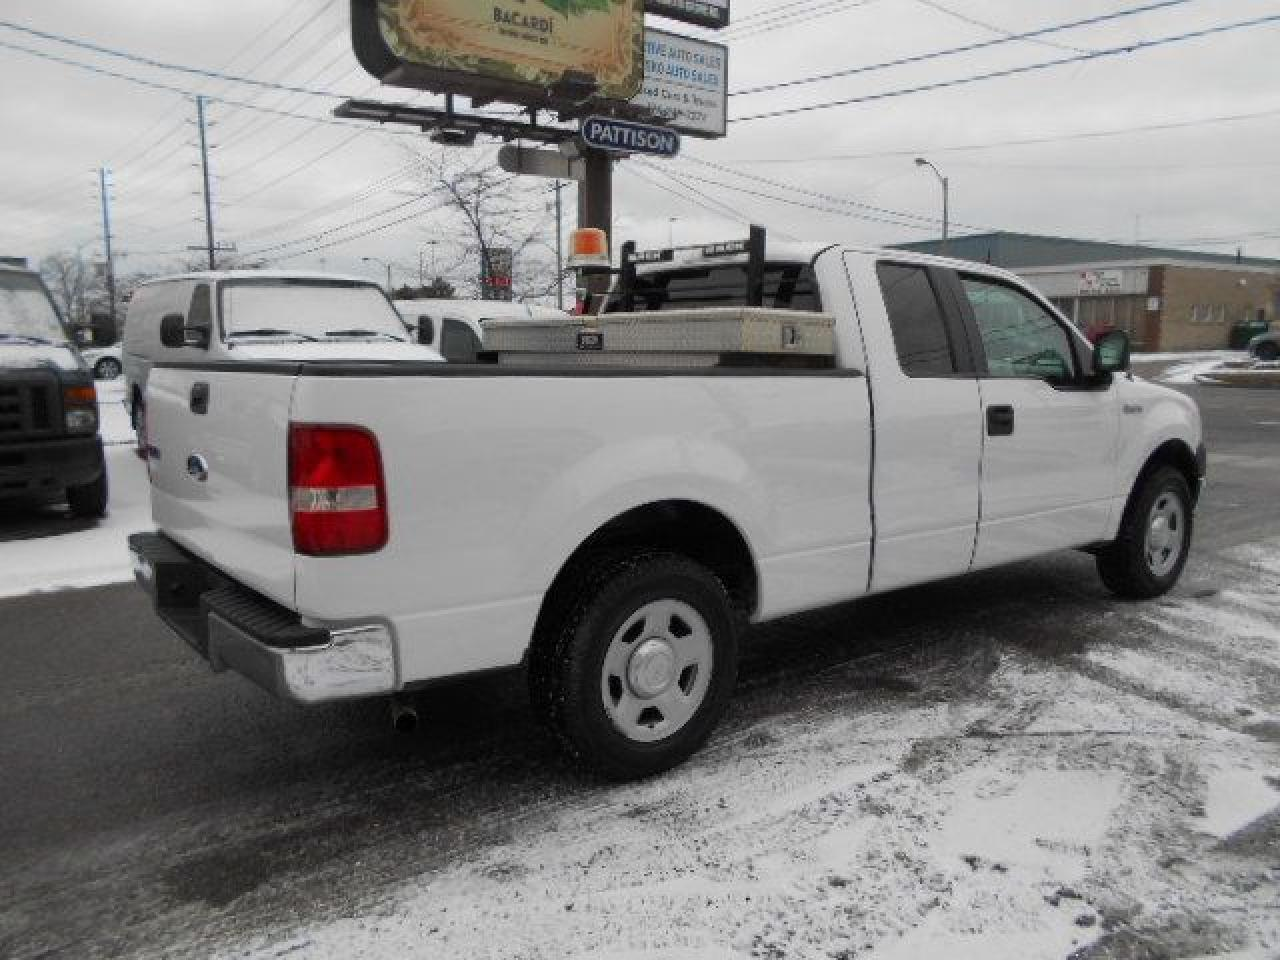 2007 Ford F-150 XL 4.6L V8 Extended Cab Back Rack Tool Box 226km